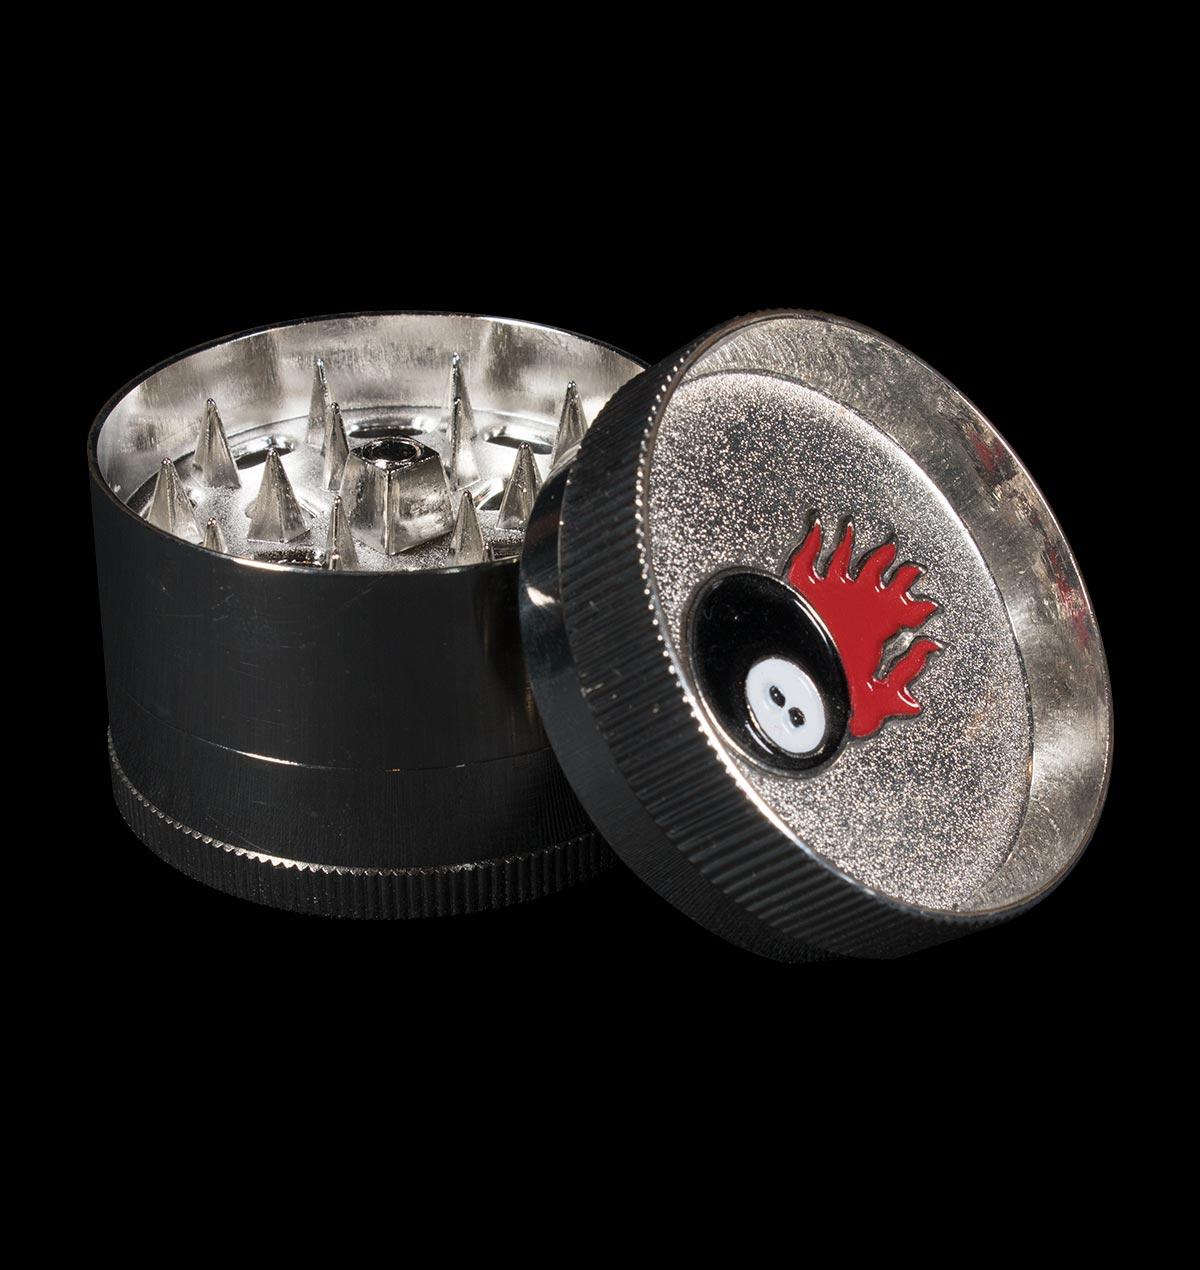 Metal 8-ball Grinder